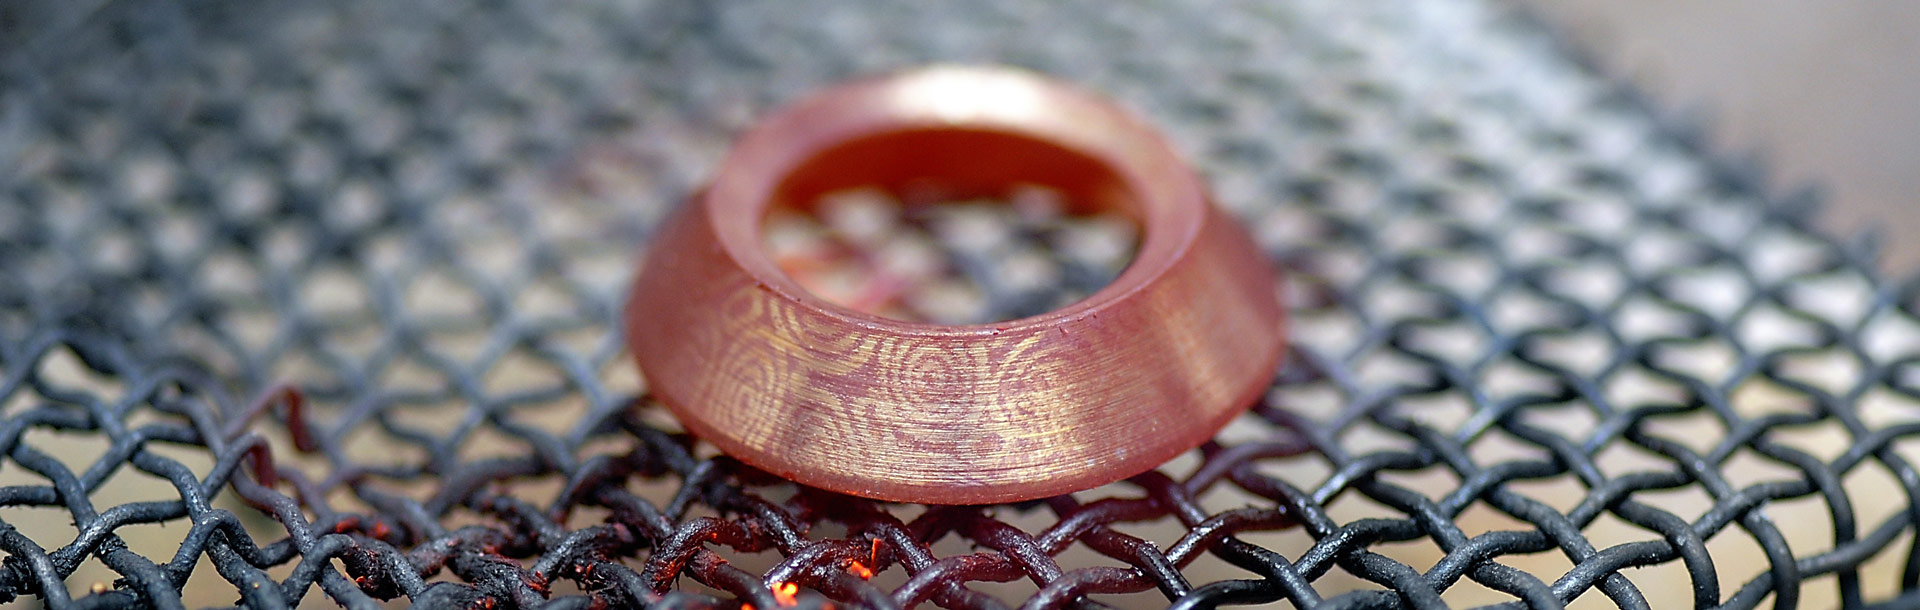 Snubni Prsteny Vintage 40 0775 Invencie